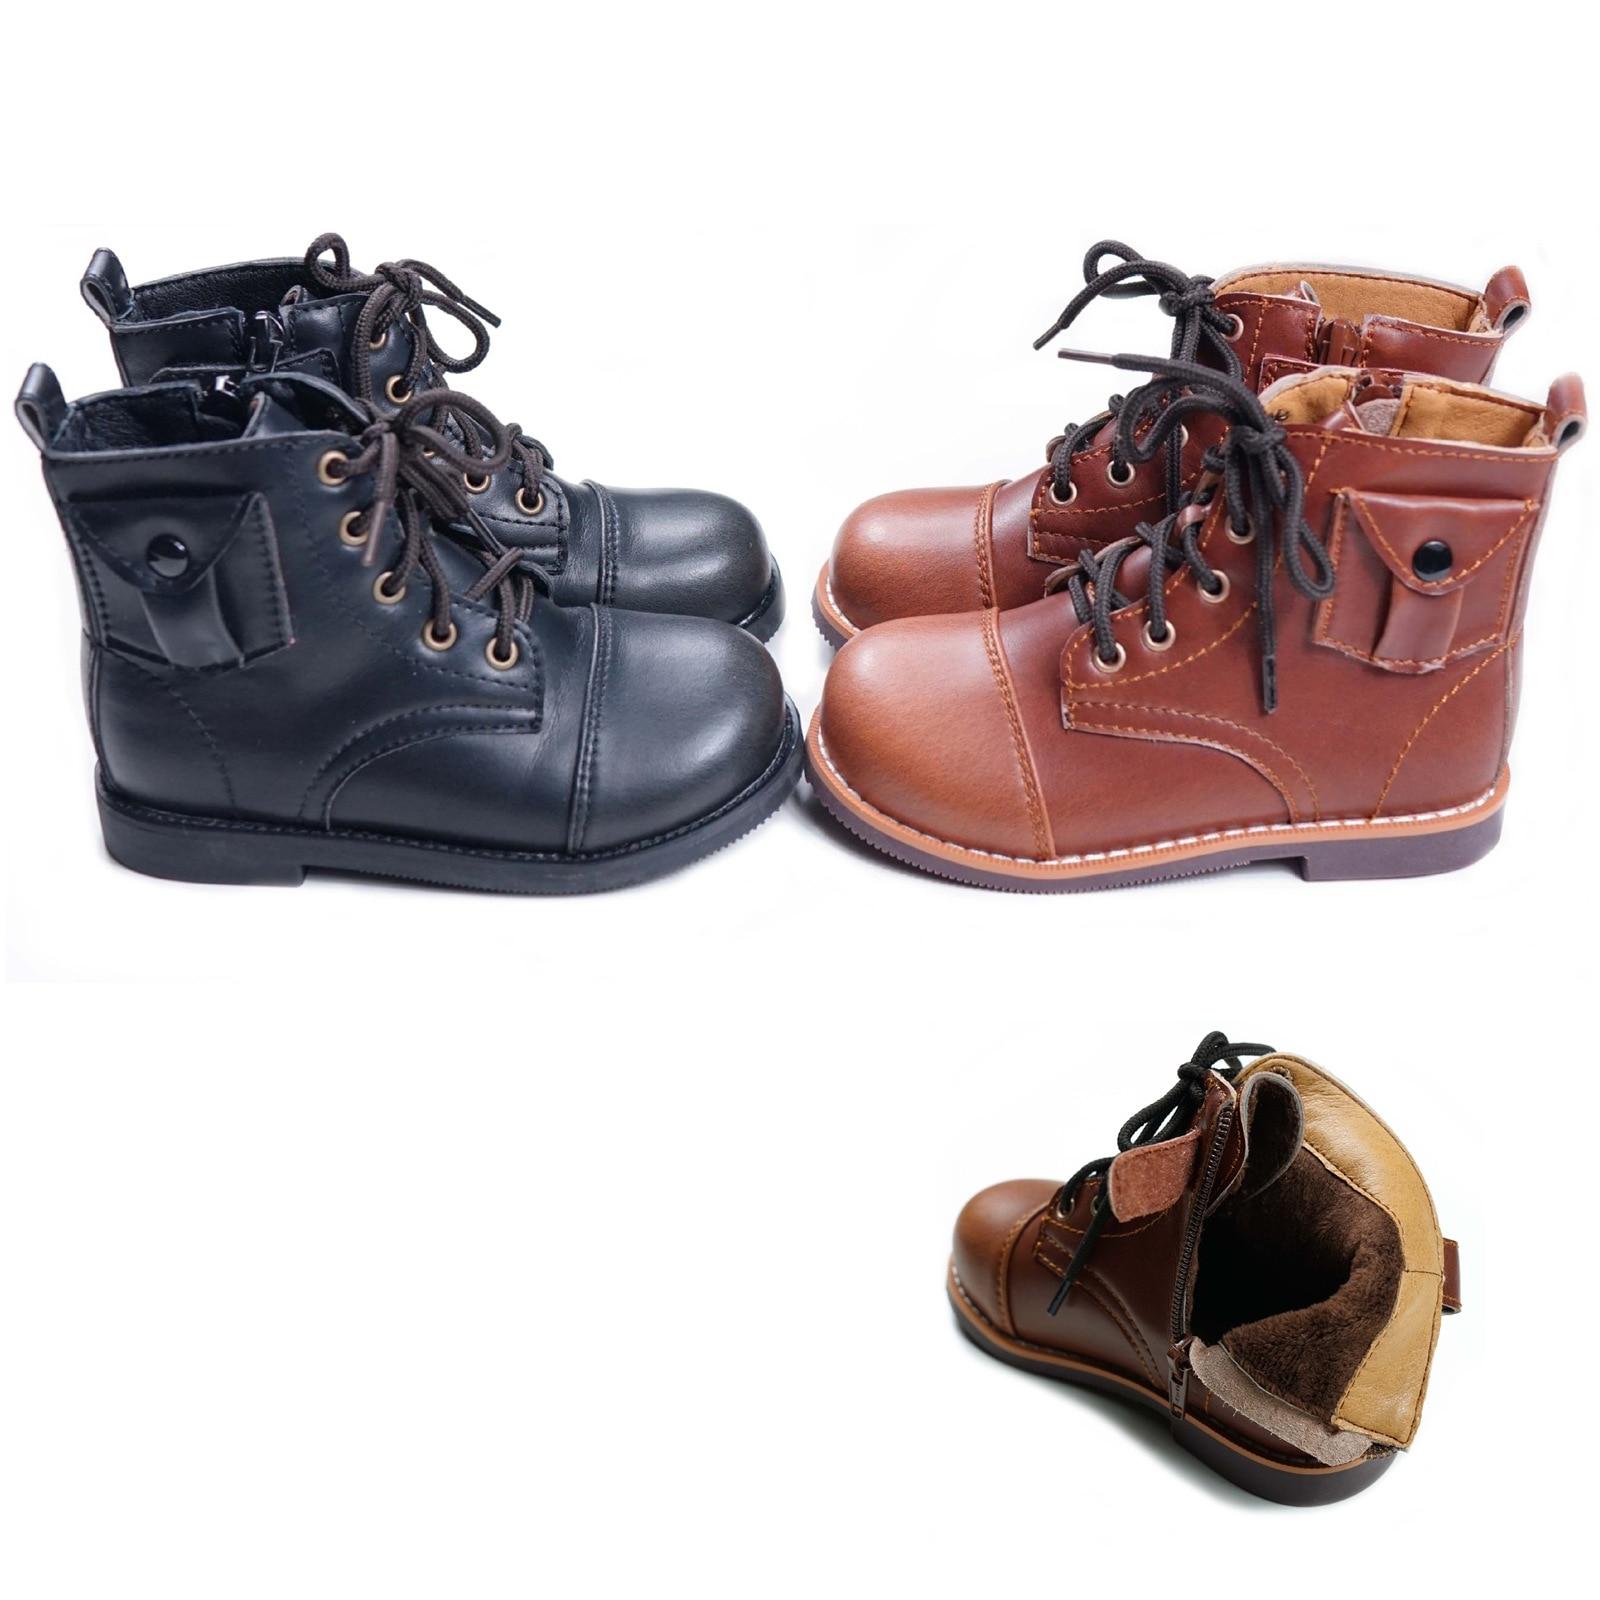 New Children Boots Winter Warm Plush Kids Martin Boots Fashion Shoes Boys Girls Snow Boots